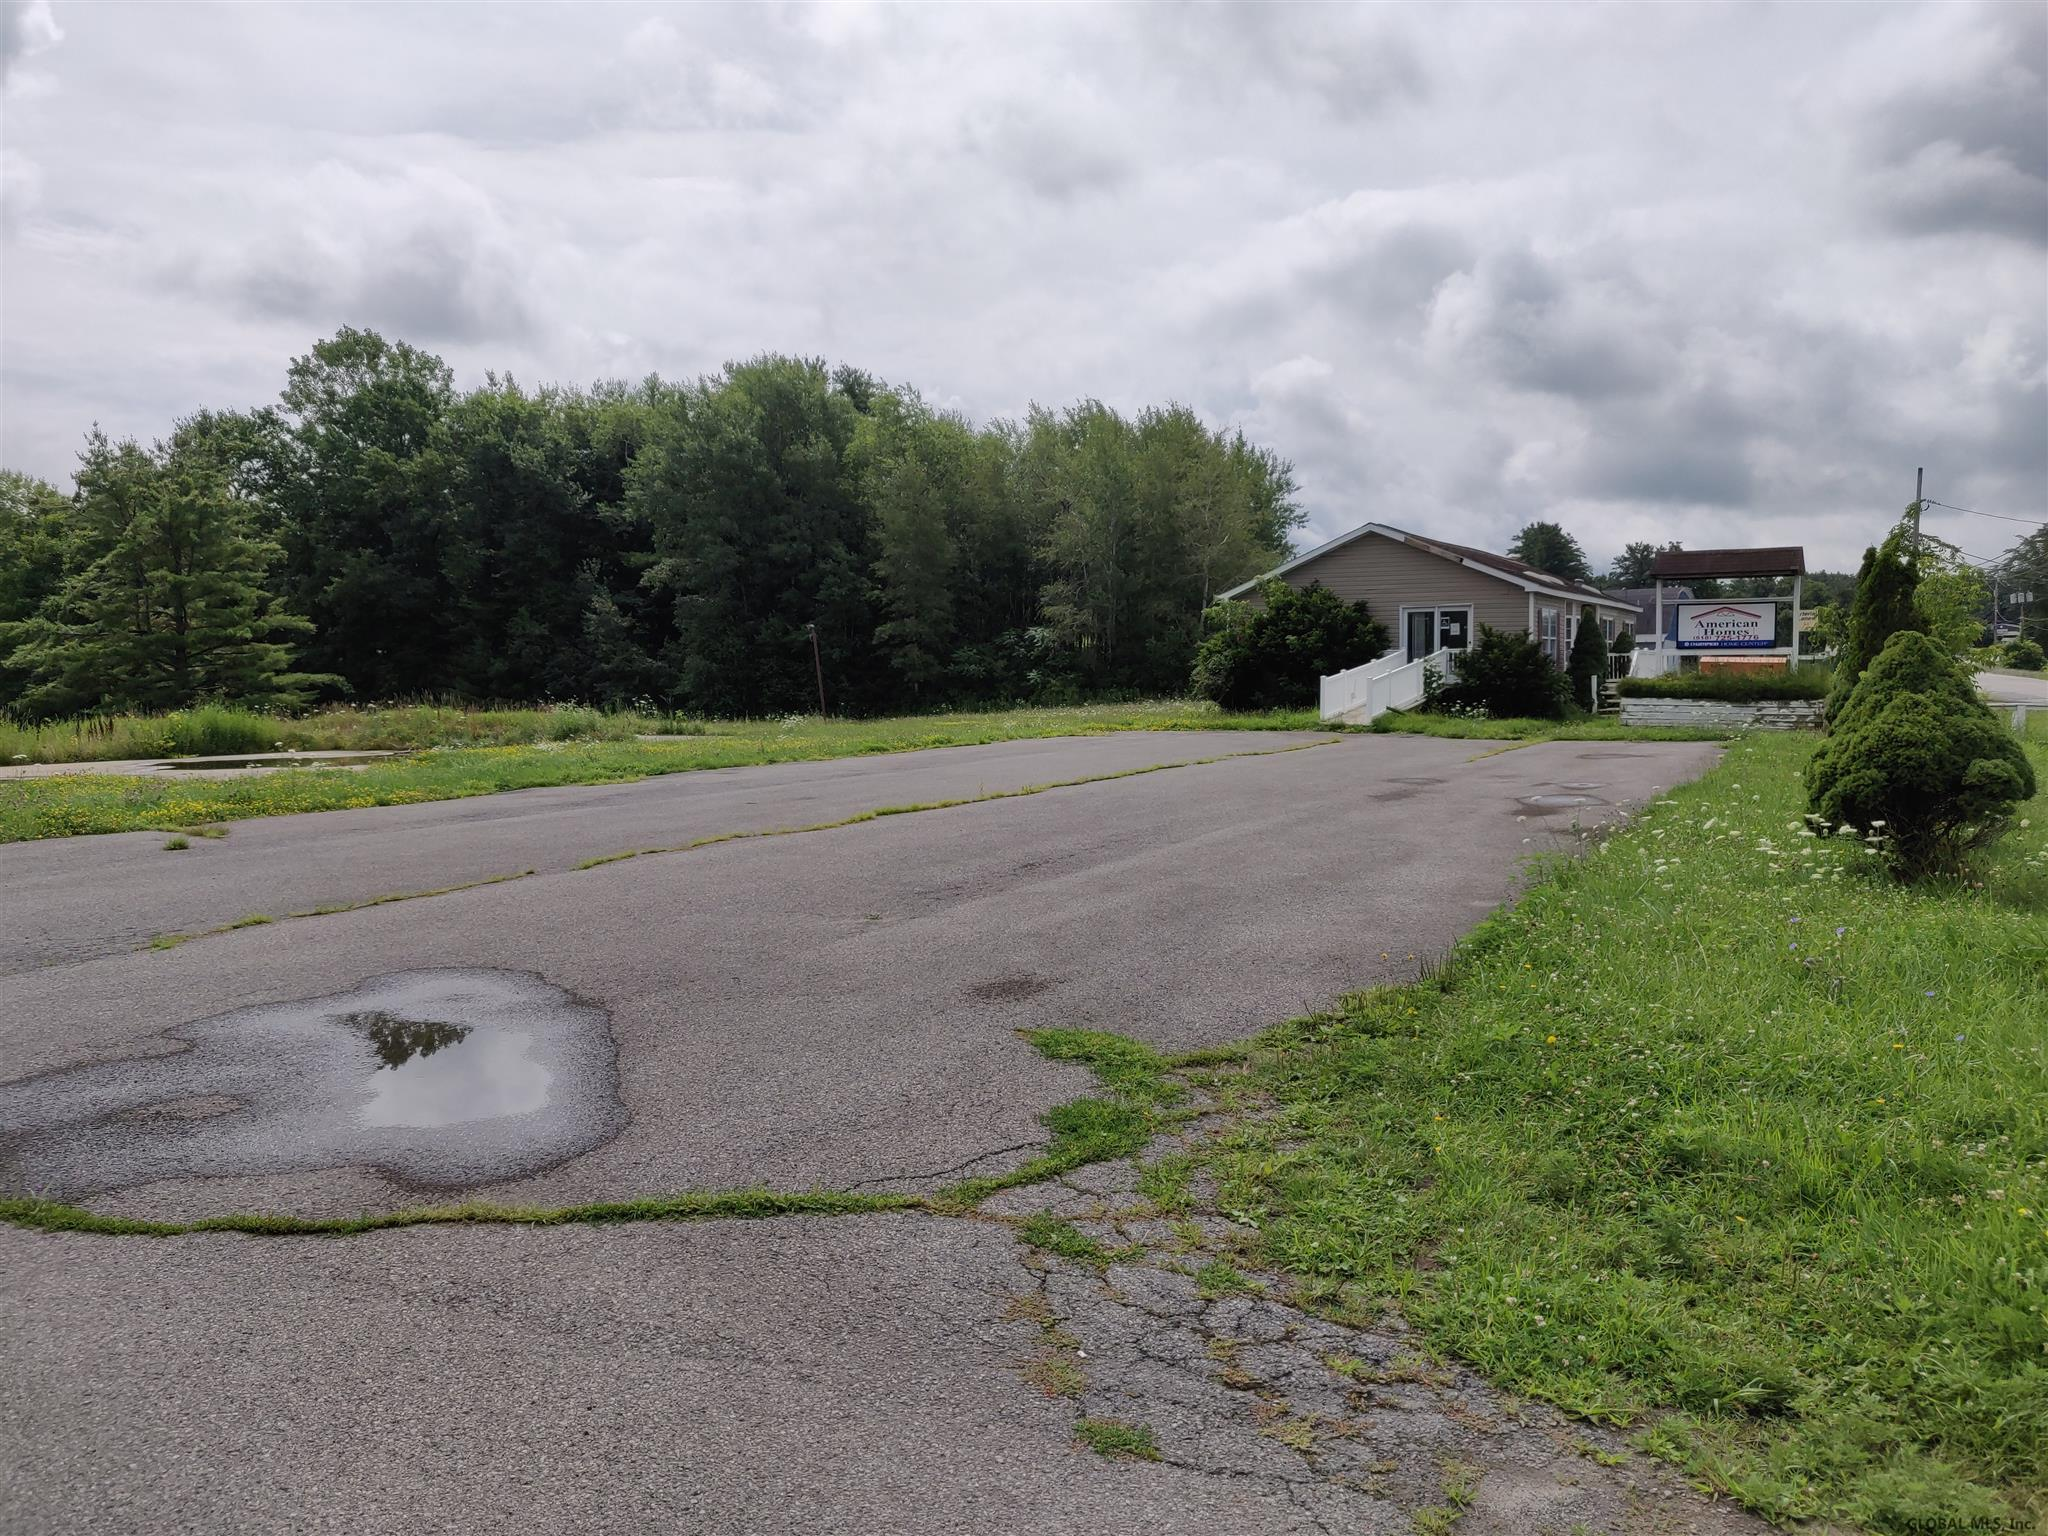 Johnstown image 5